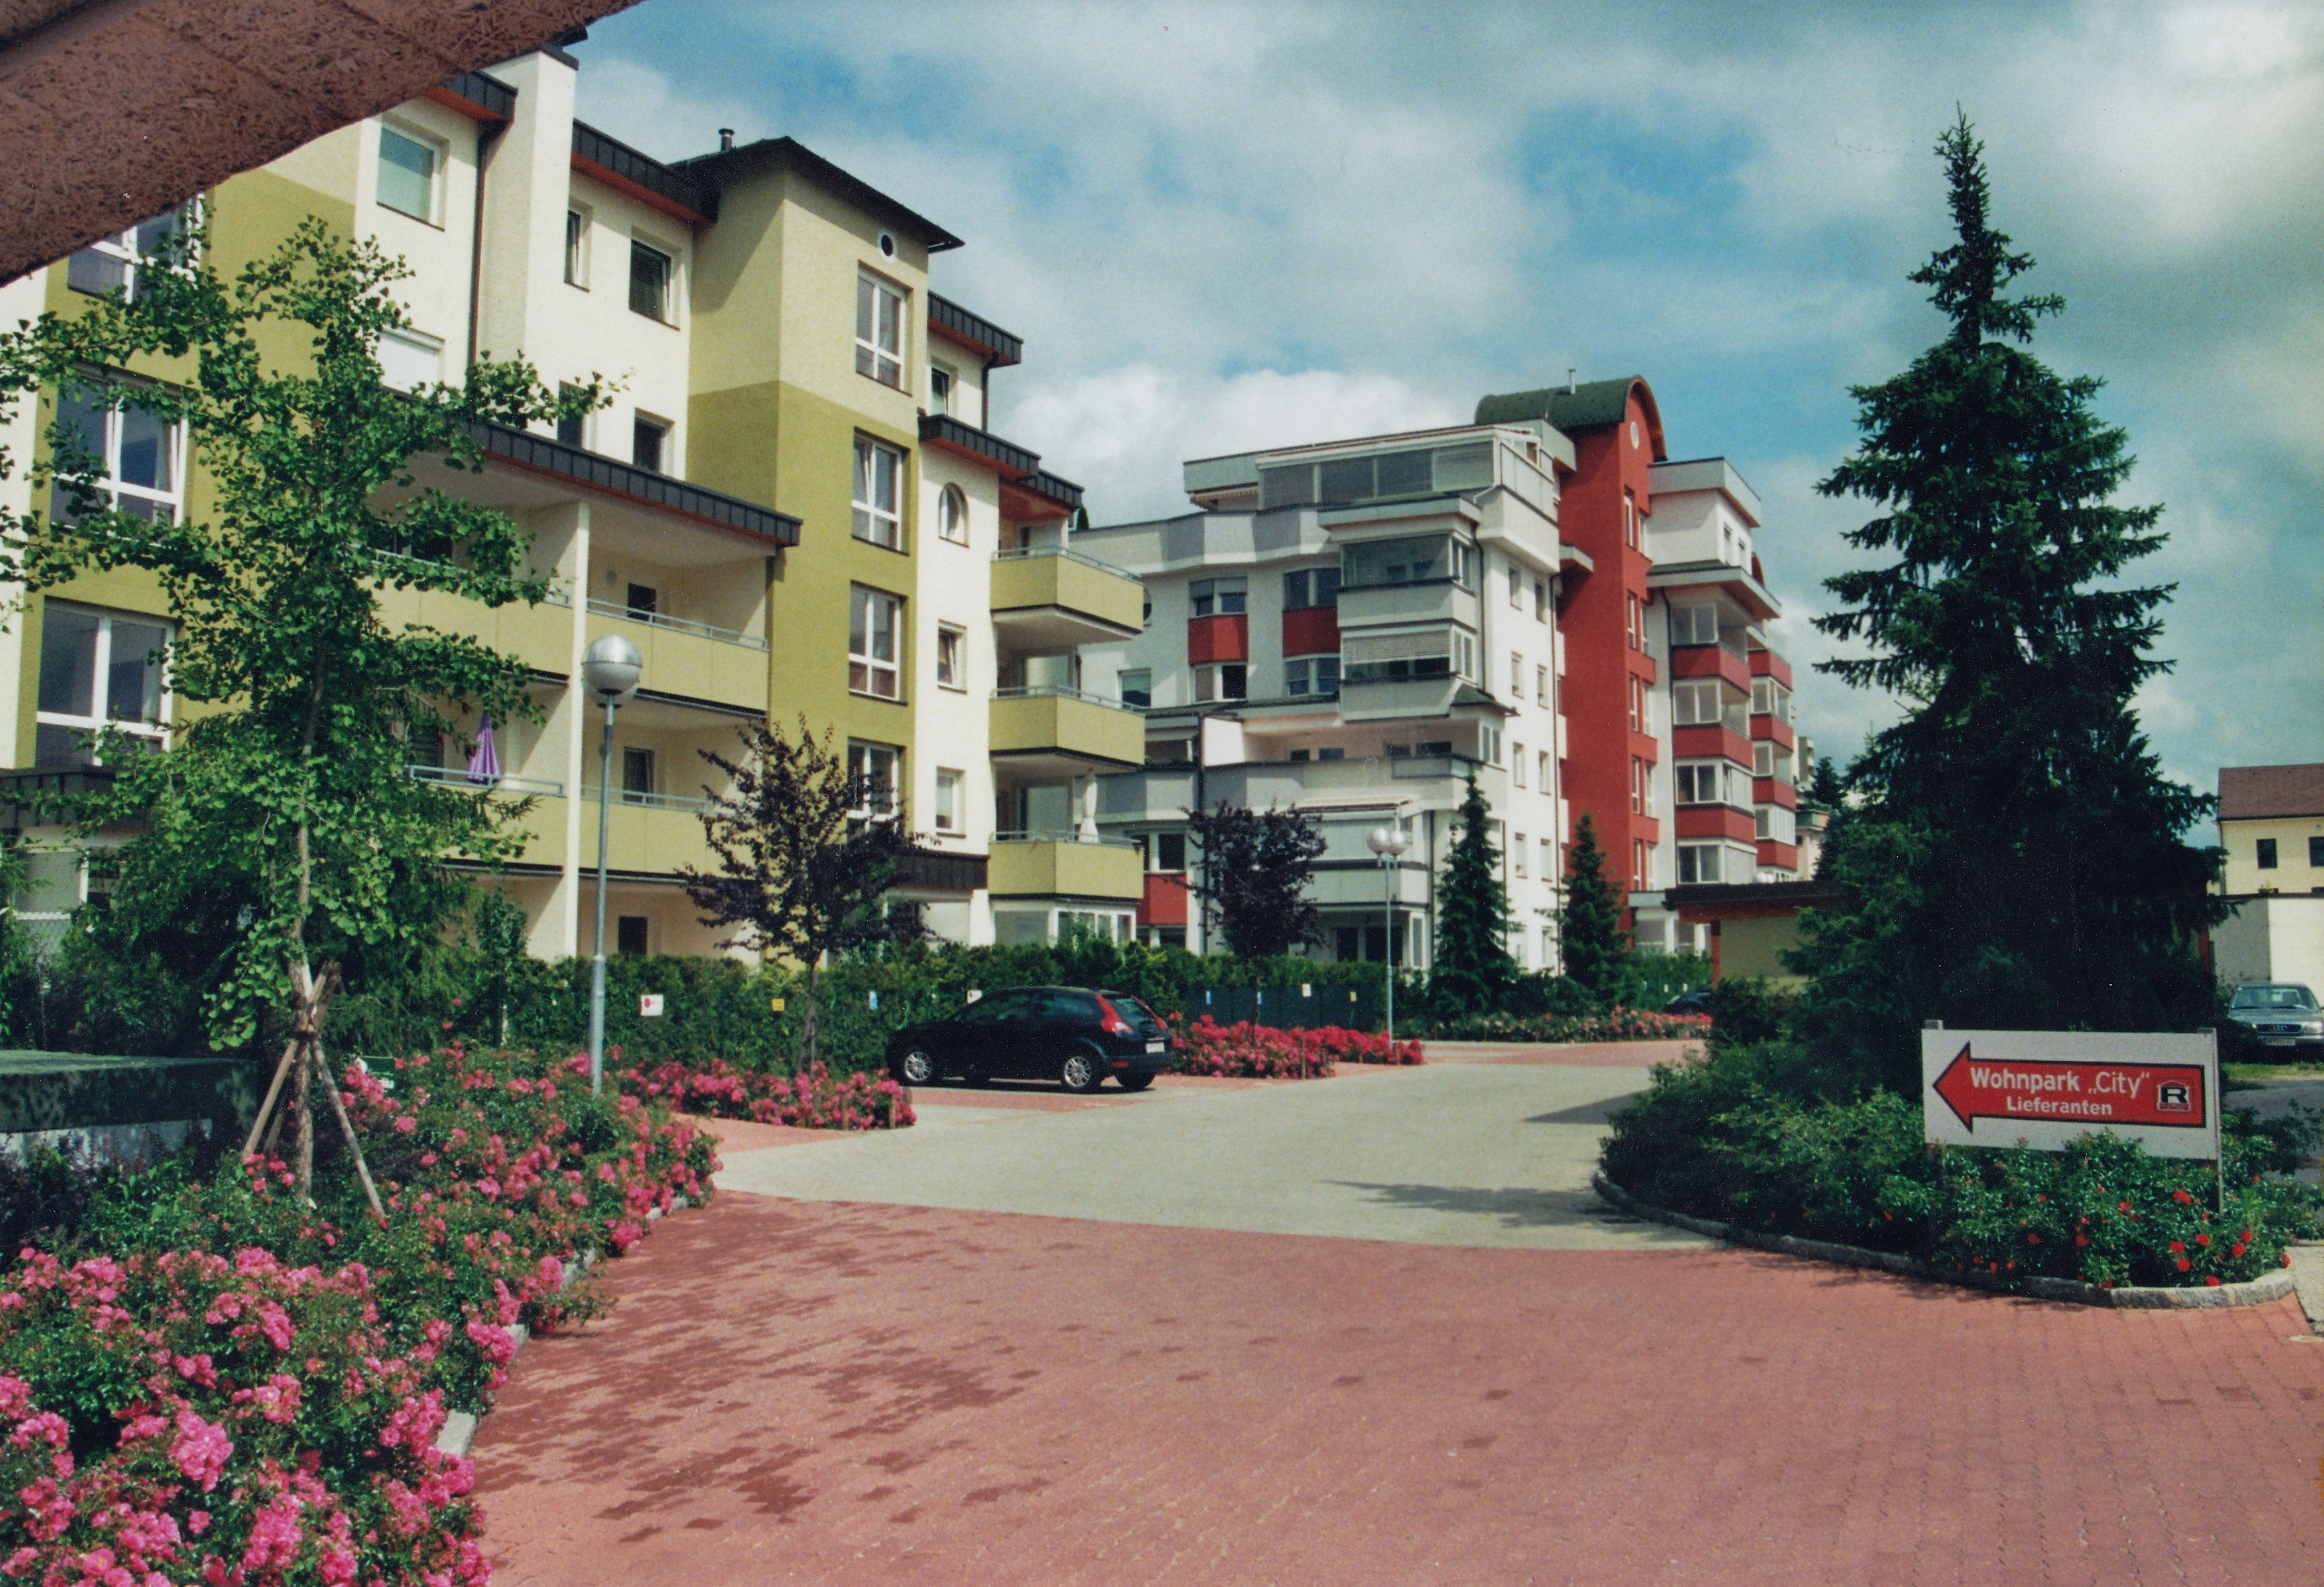 St. Veiterring, Wohnpark City